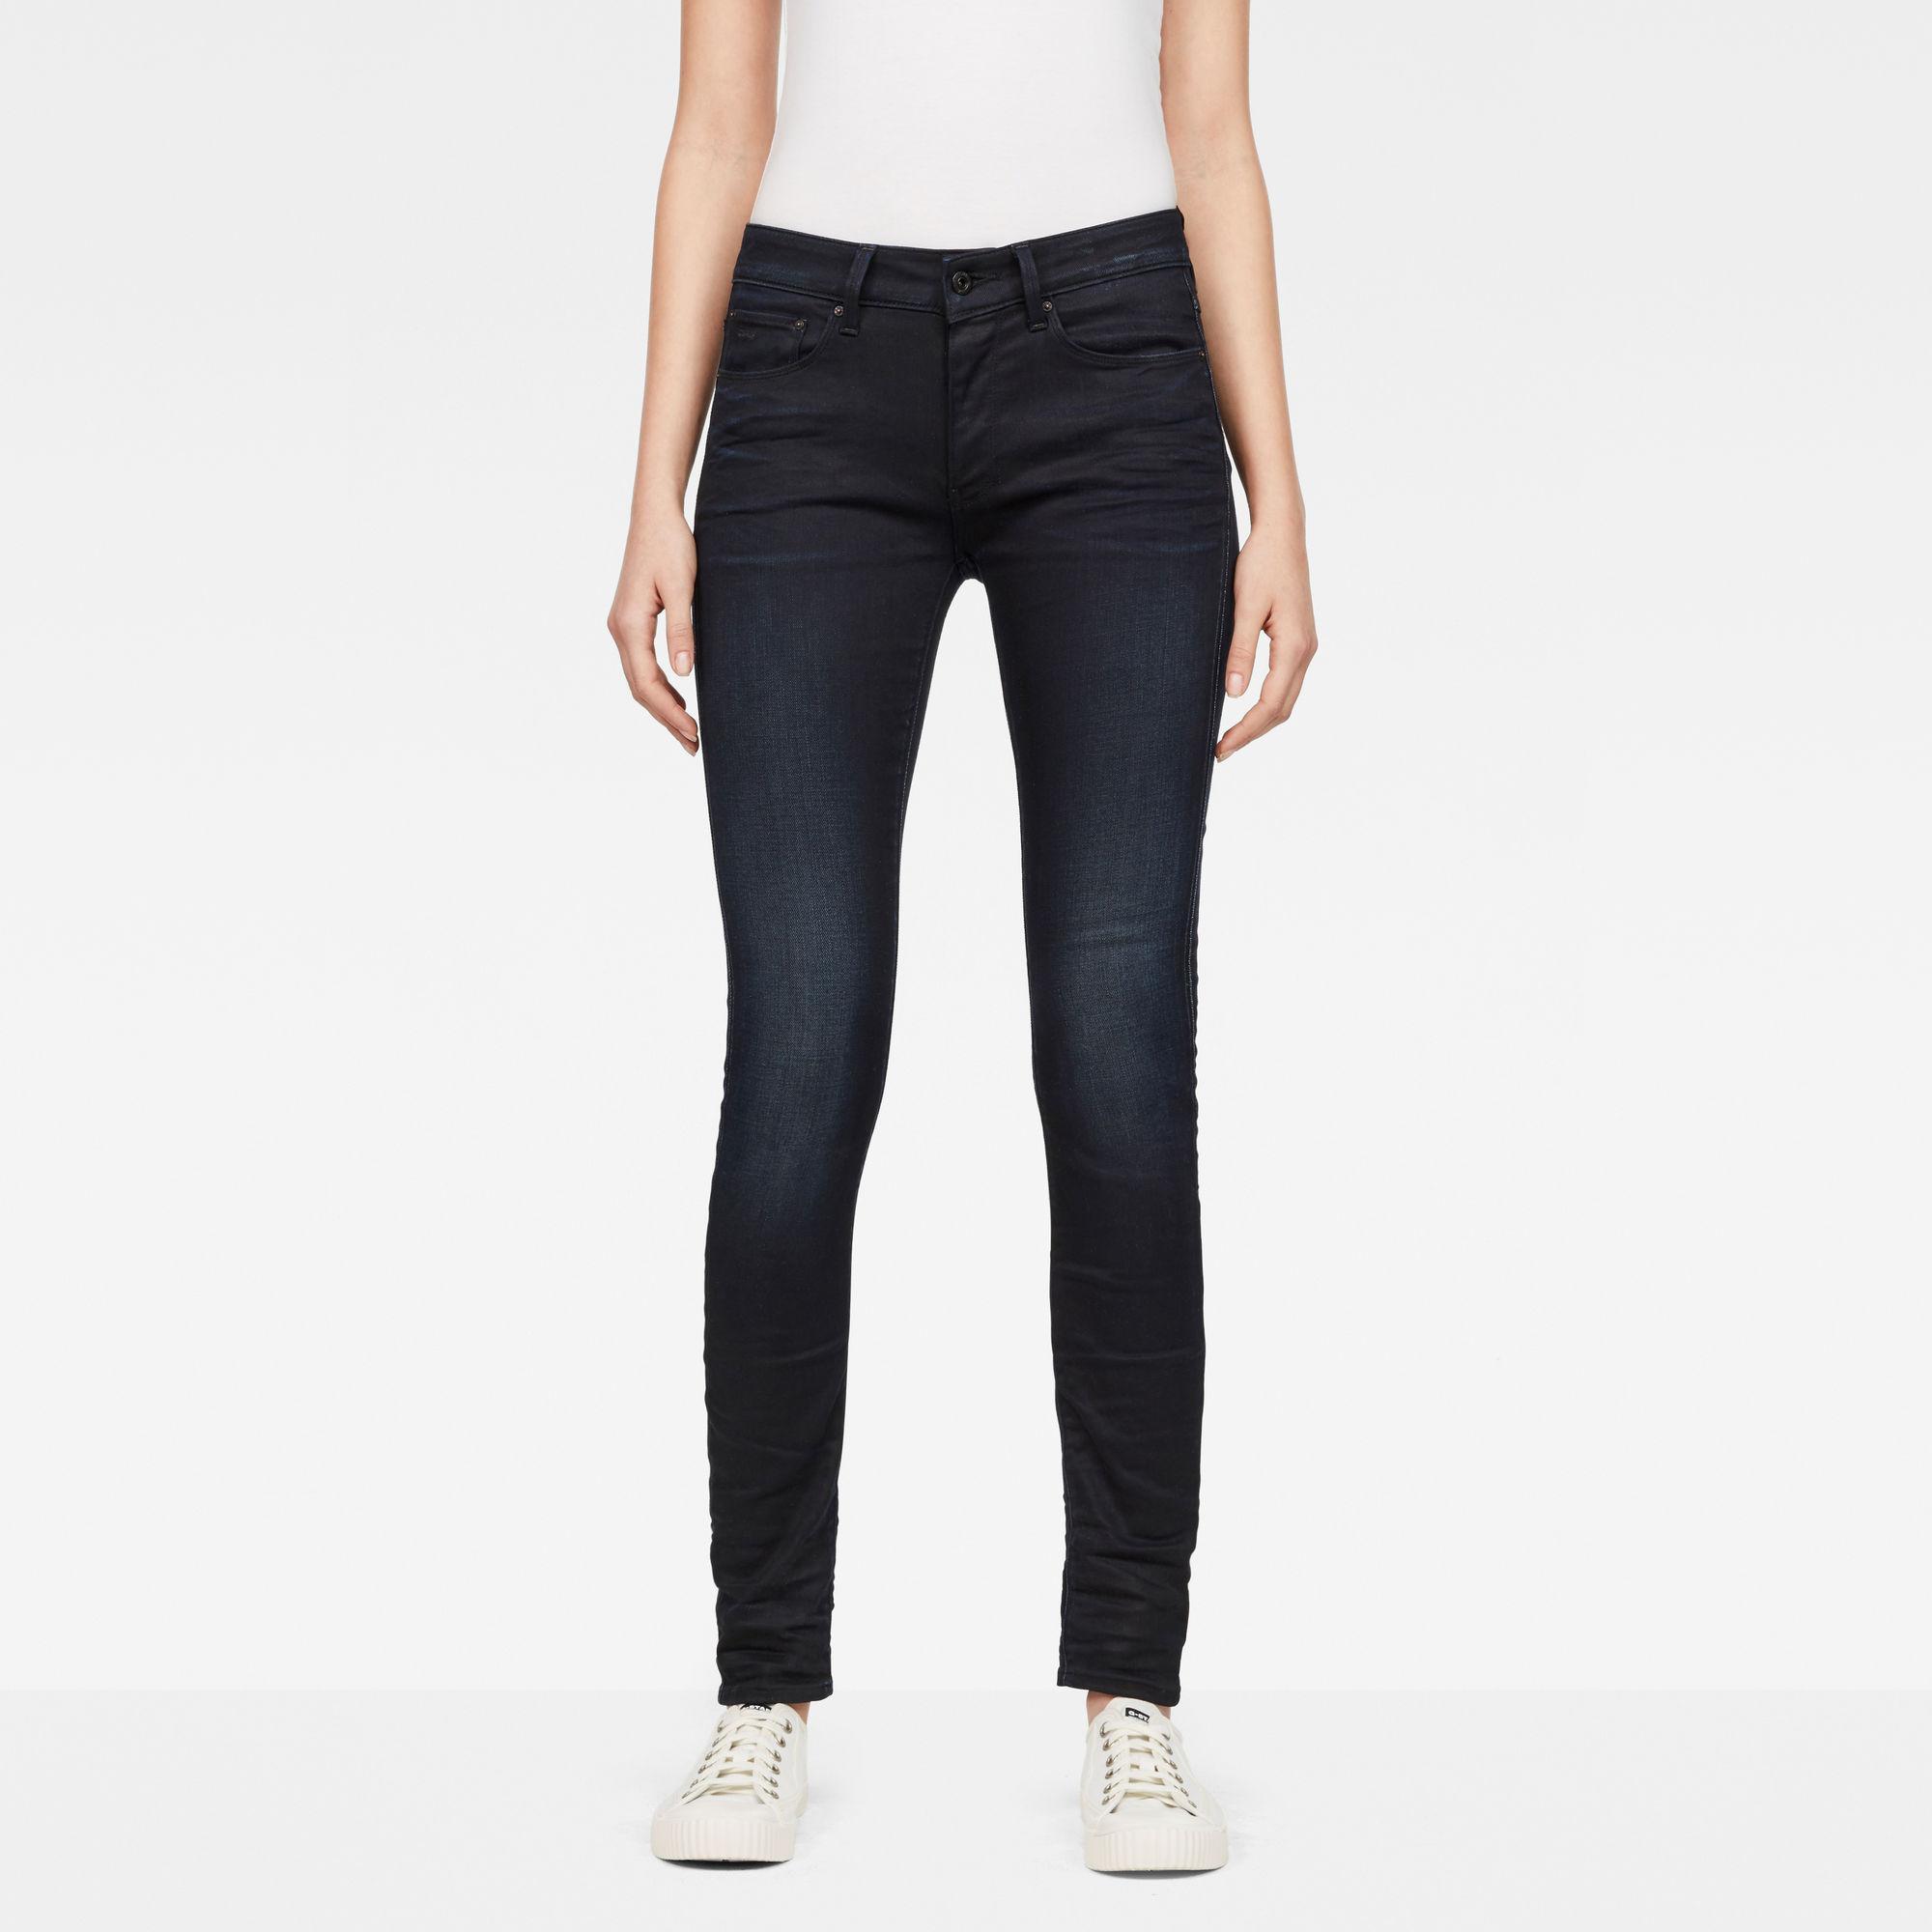 Van G Star Raw 3301 High Waist Skinny Jeans Prijsvergelijk nu!